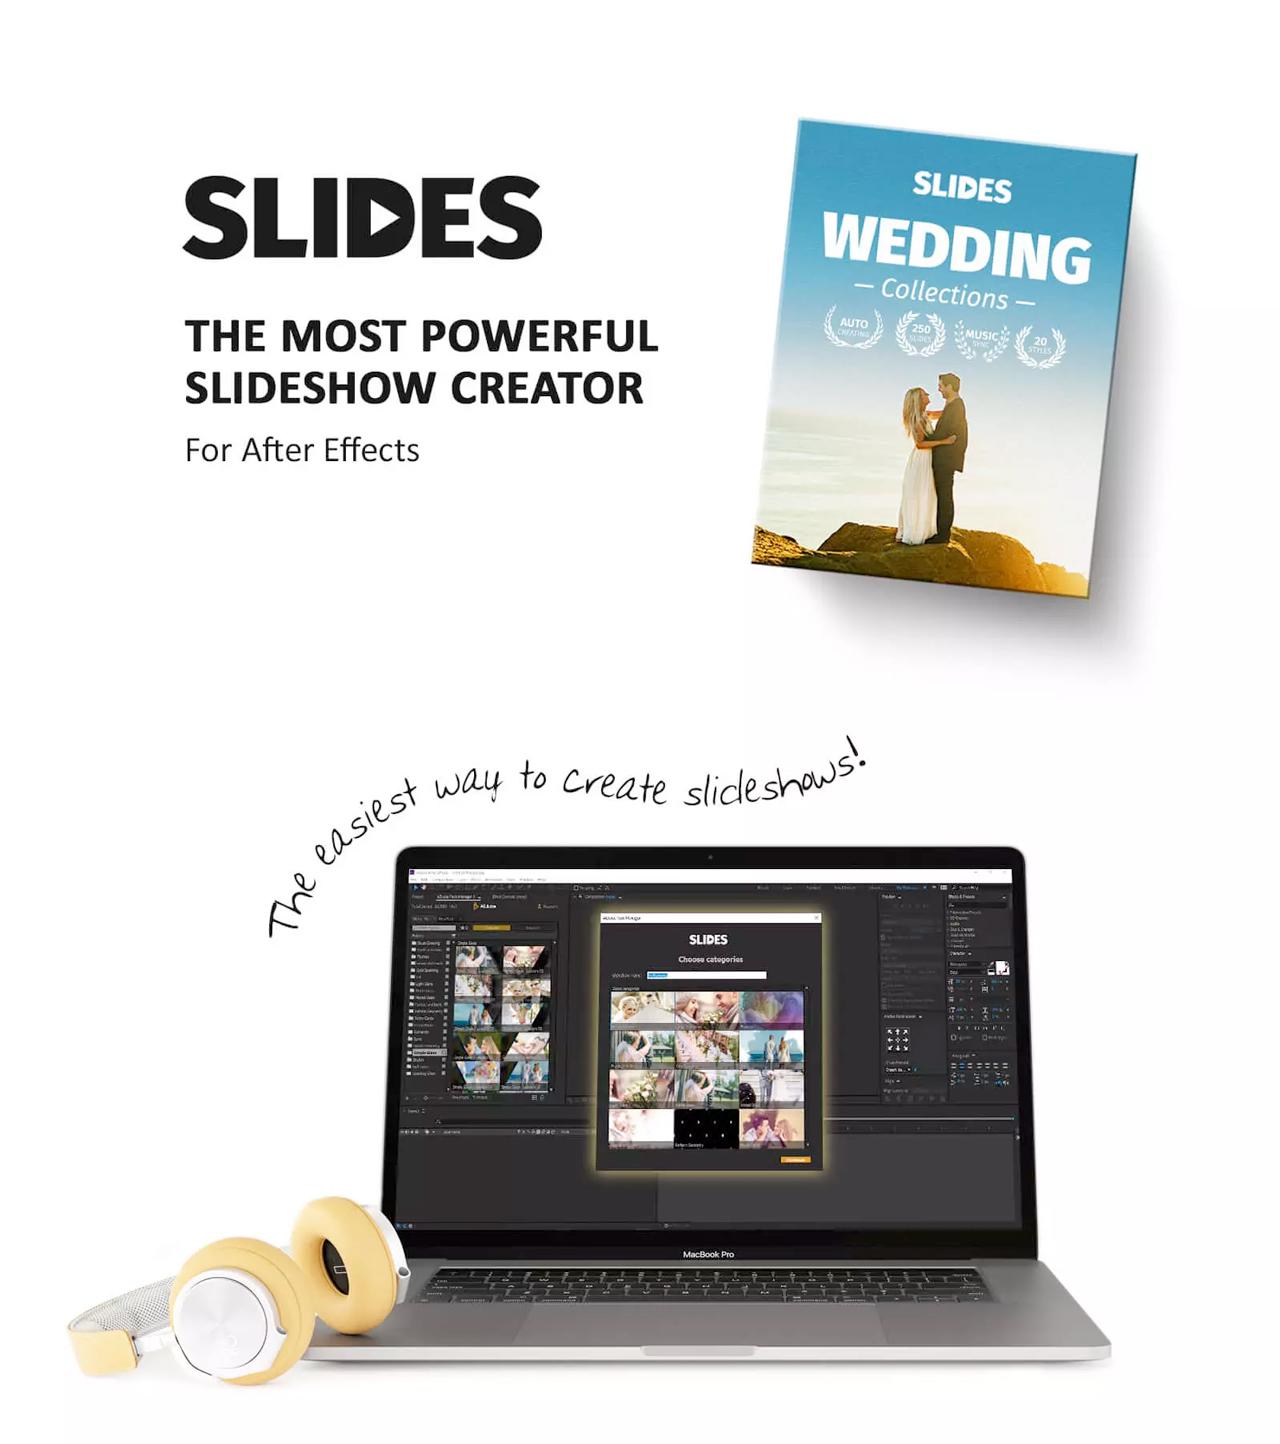 aejuice slides - wedding collection hero